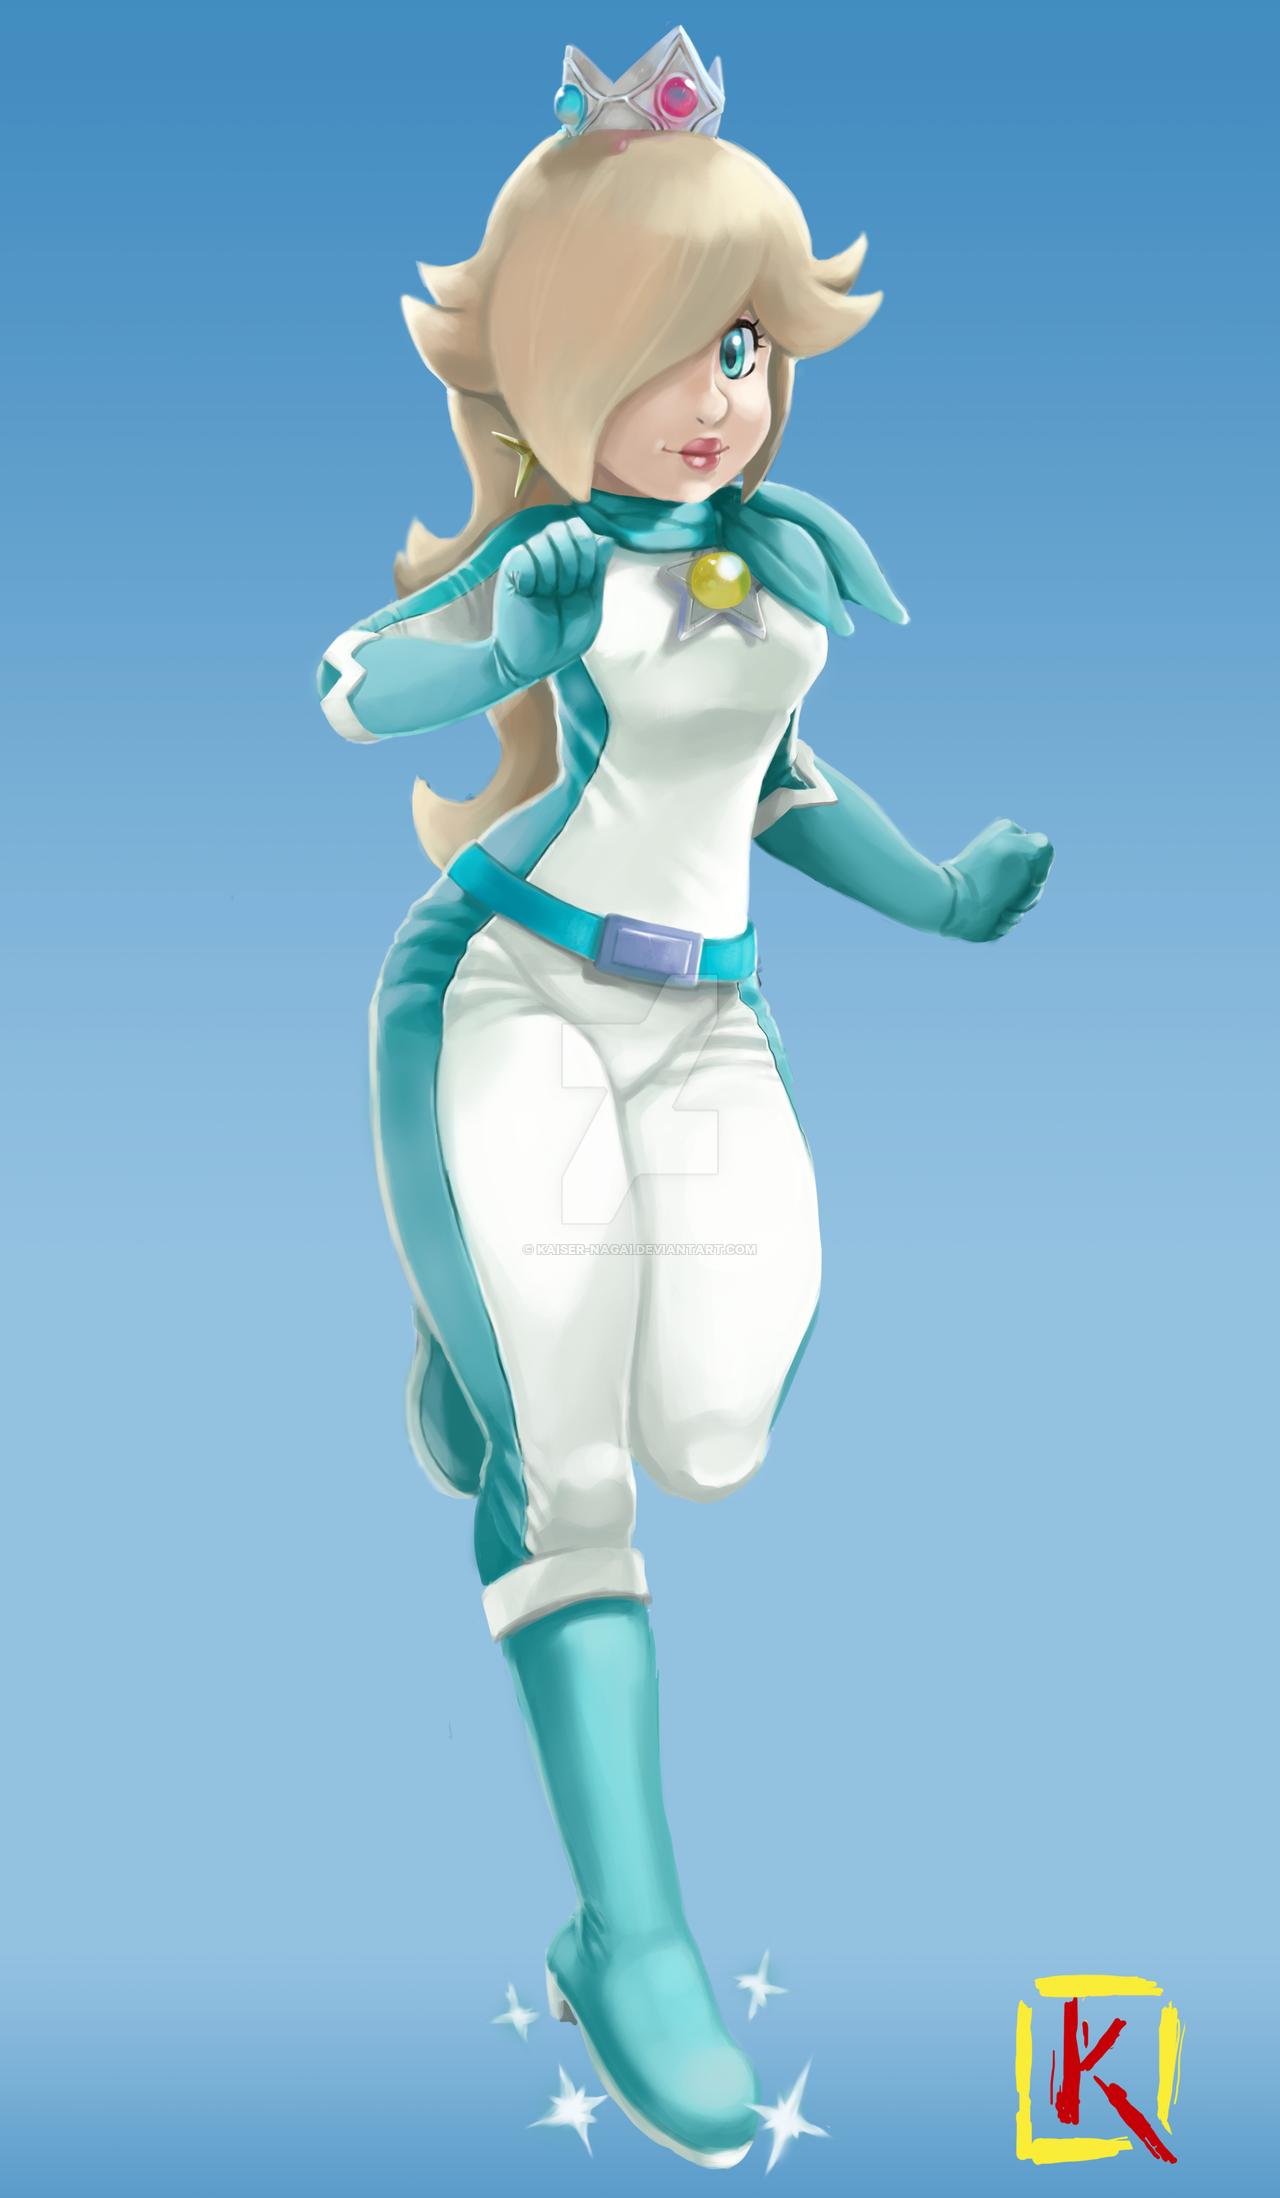 Princess Rosalina (Mario Kart 8 motorcycle suit) by kaiser nagai ...